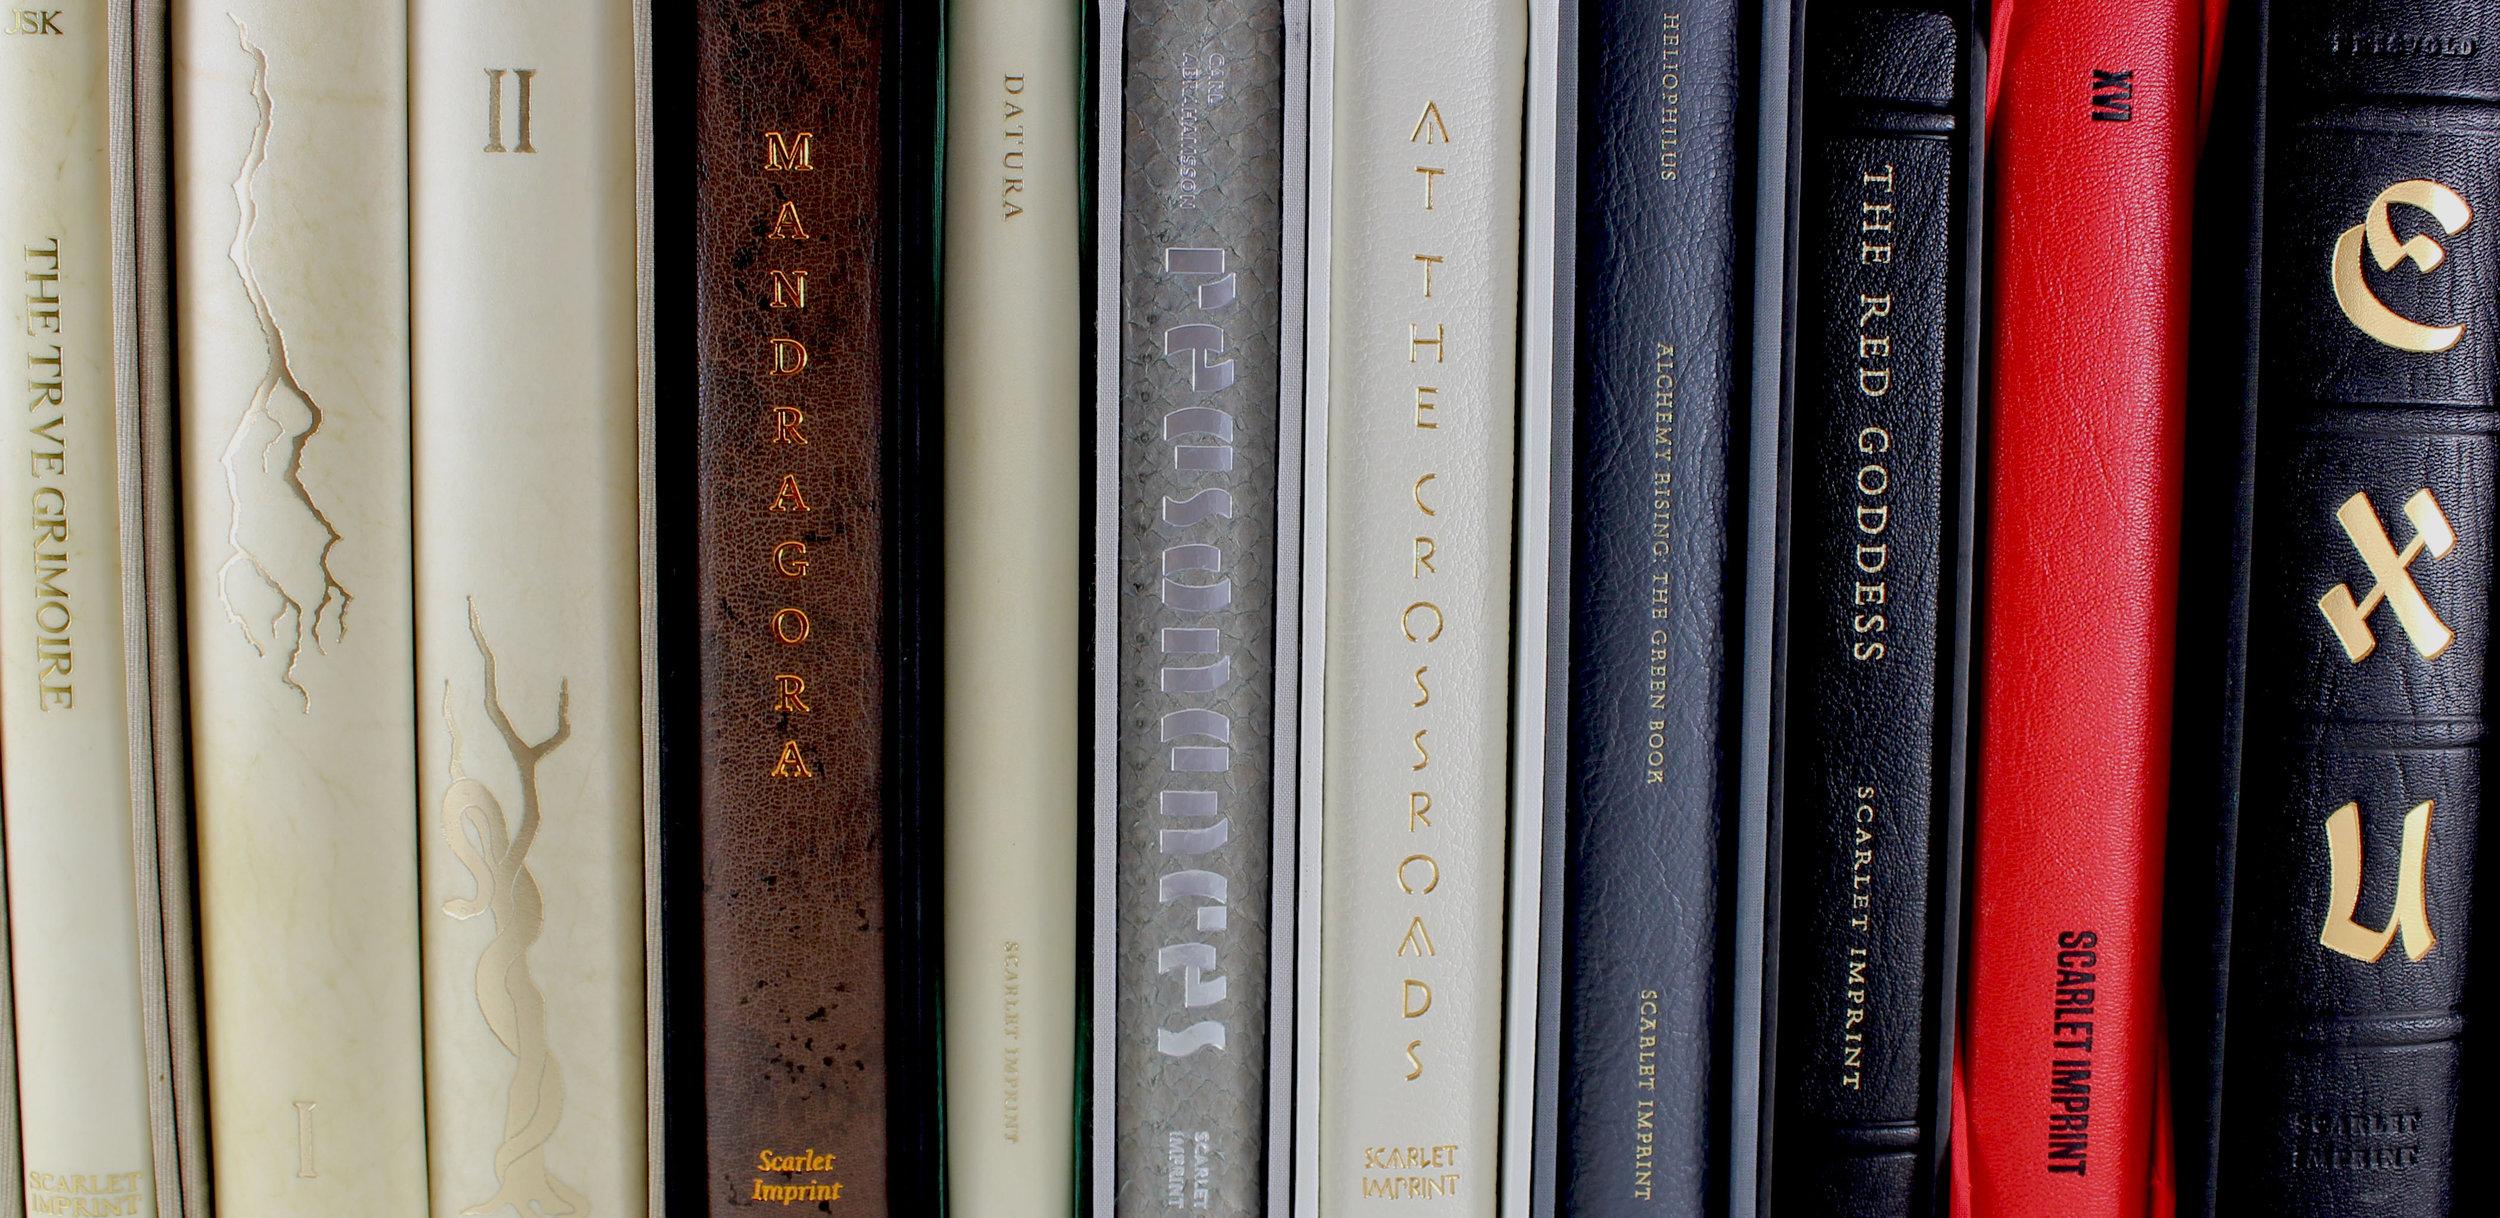 Fine editions